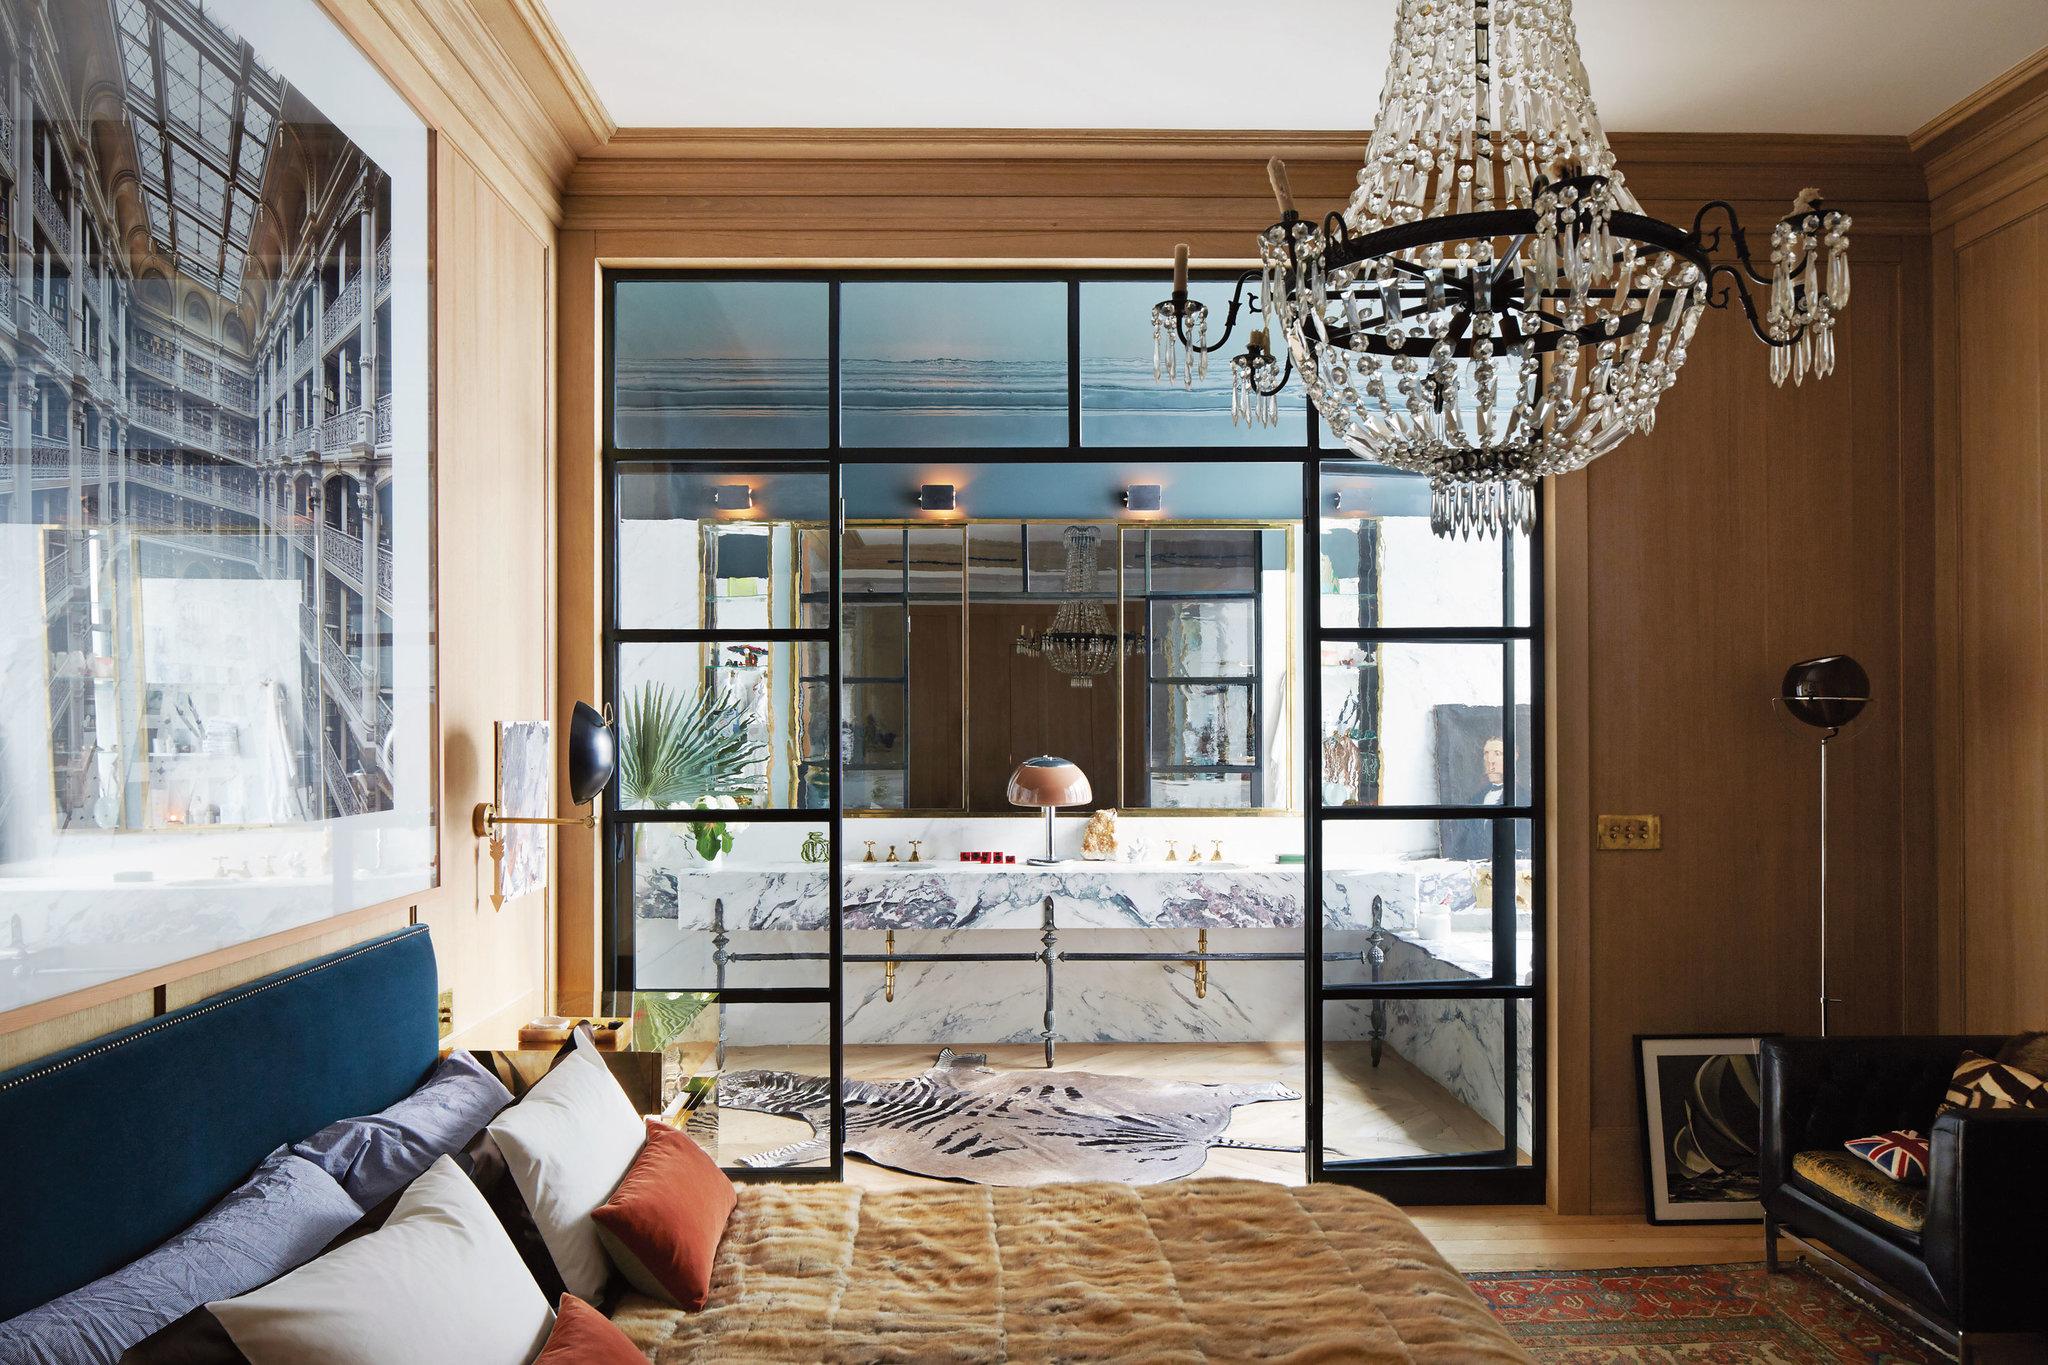 tmag jenna slide T6JM superJumbo - O Apartamento da Jenna Lyons em New York